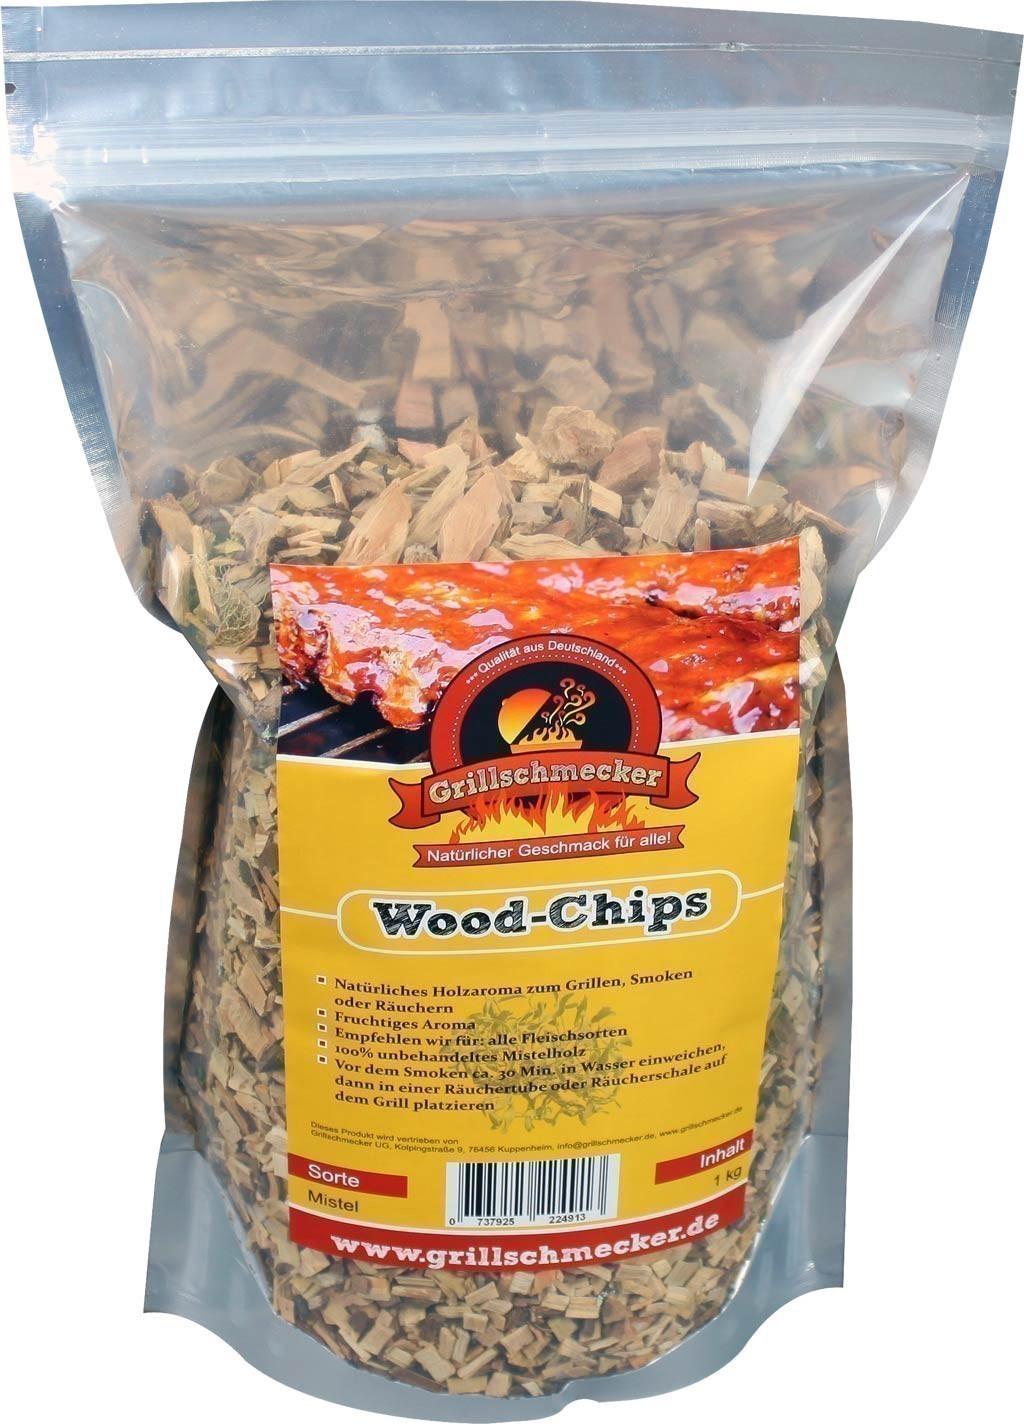 Räucherholz Wood-Chips Mistel 1kg Bild 1